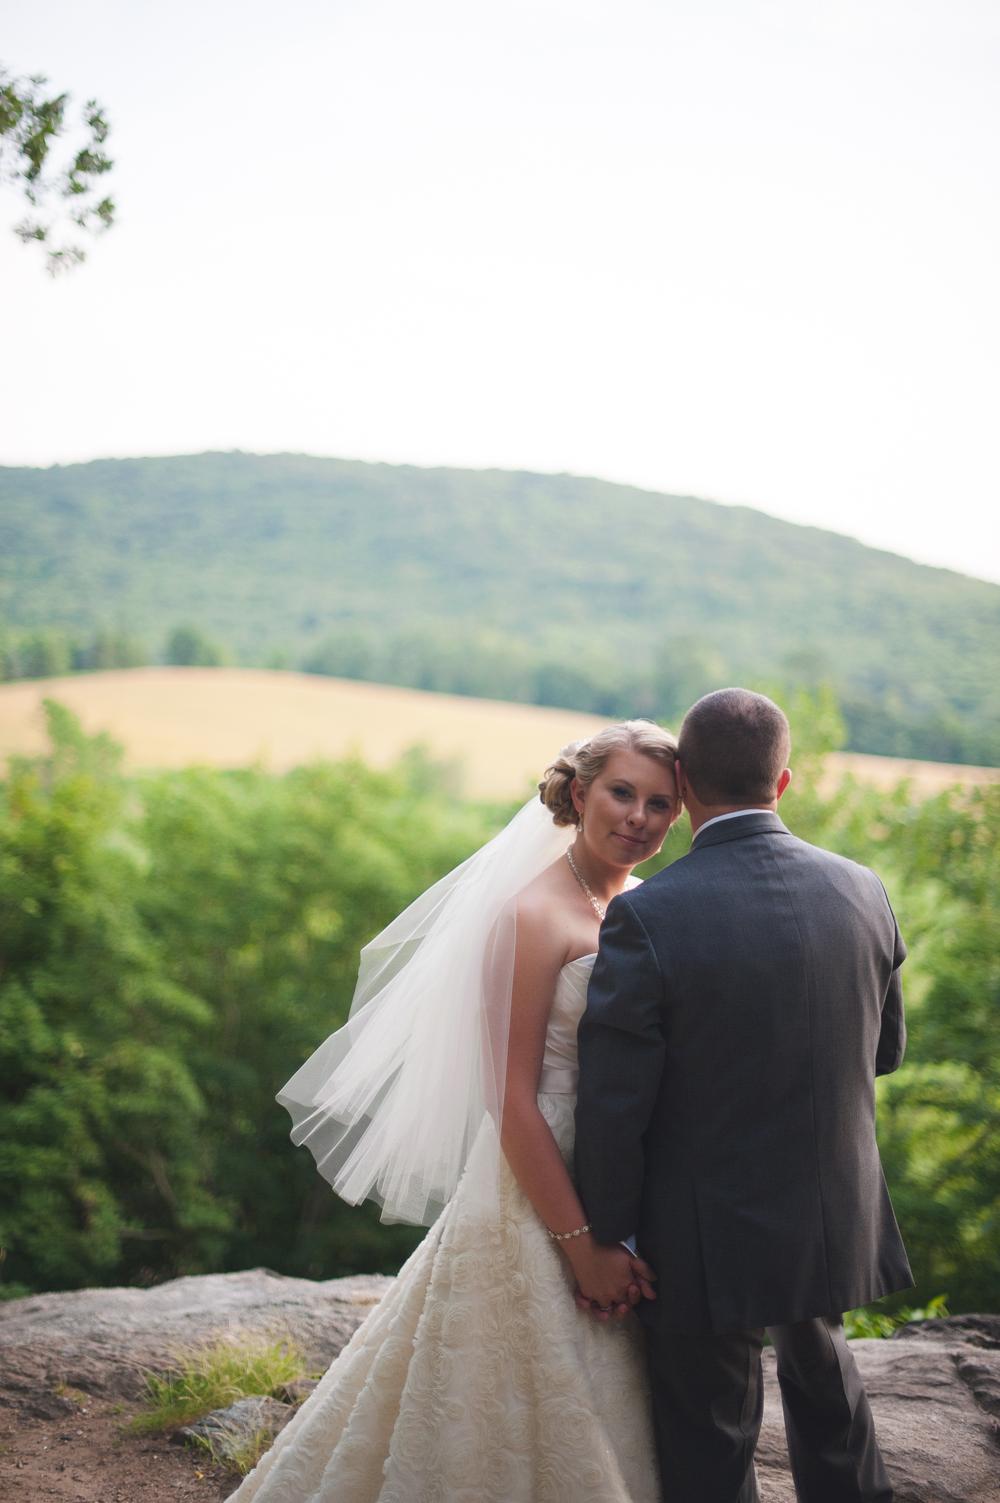 Tarrywile-Mansion-Wedding-Greg-Lewis-Photo-76